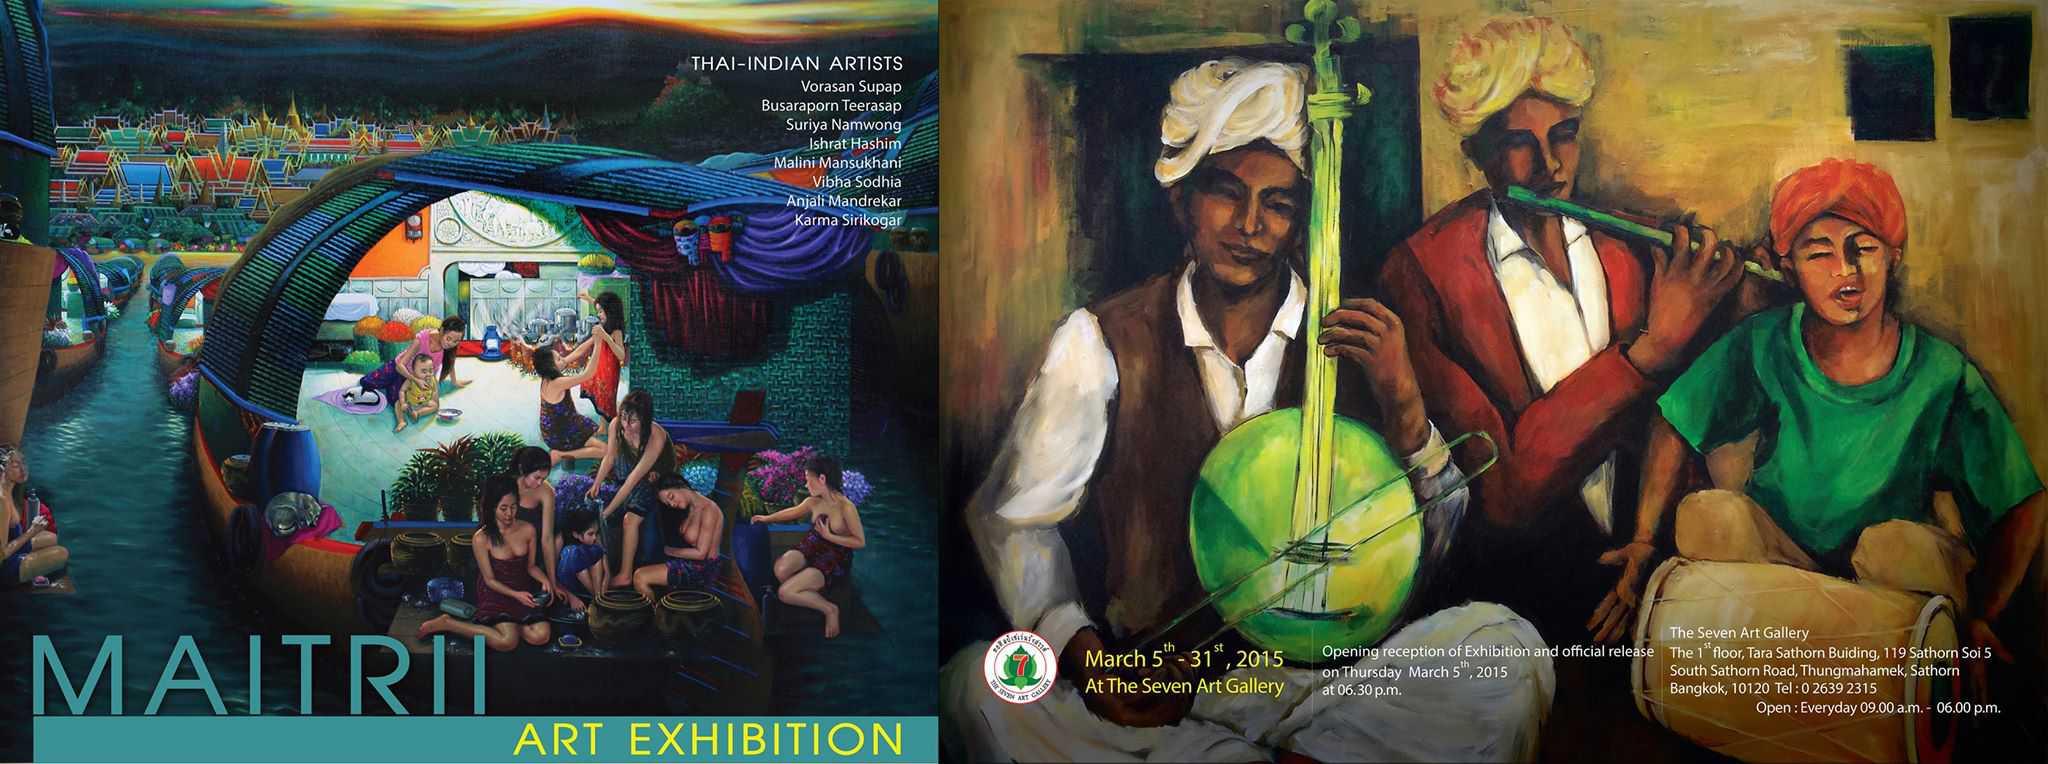 The Seven Art Gallery # Maitrii Art Exhibition